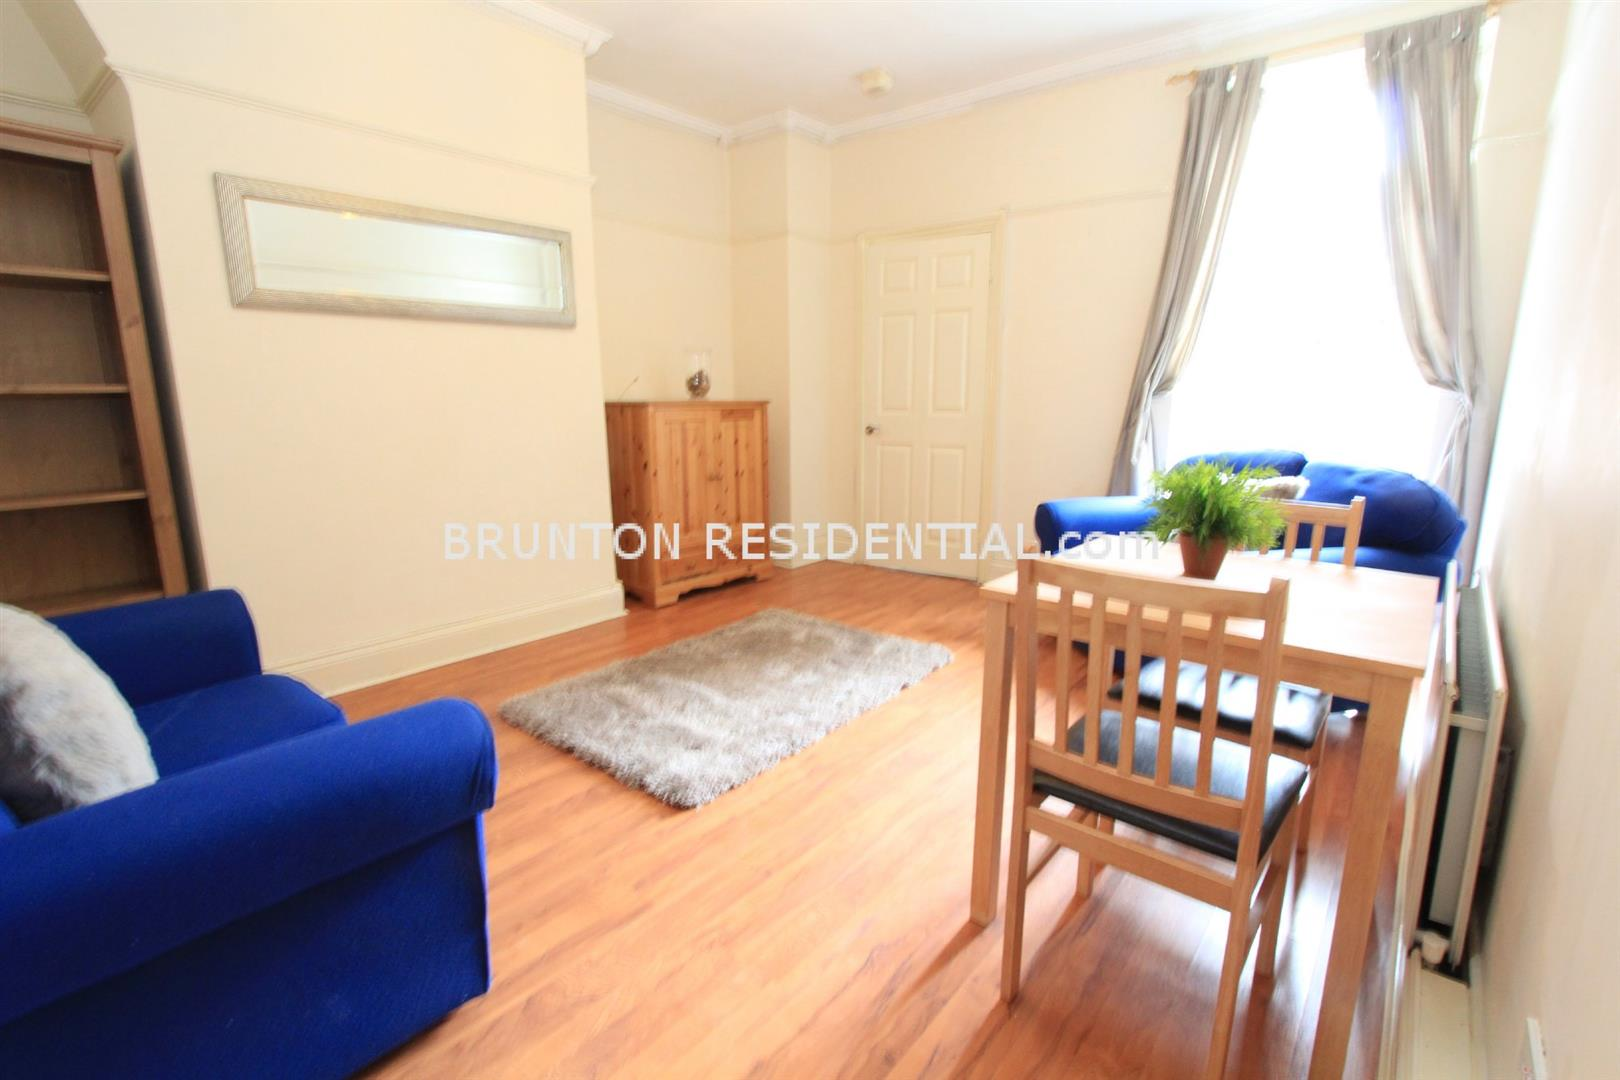 2 bed flat to rent in Newcastle Upon Tyne, NE6 5NL, NE6